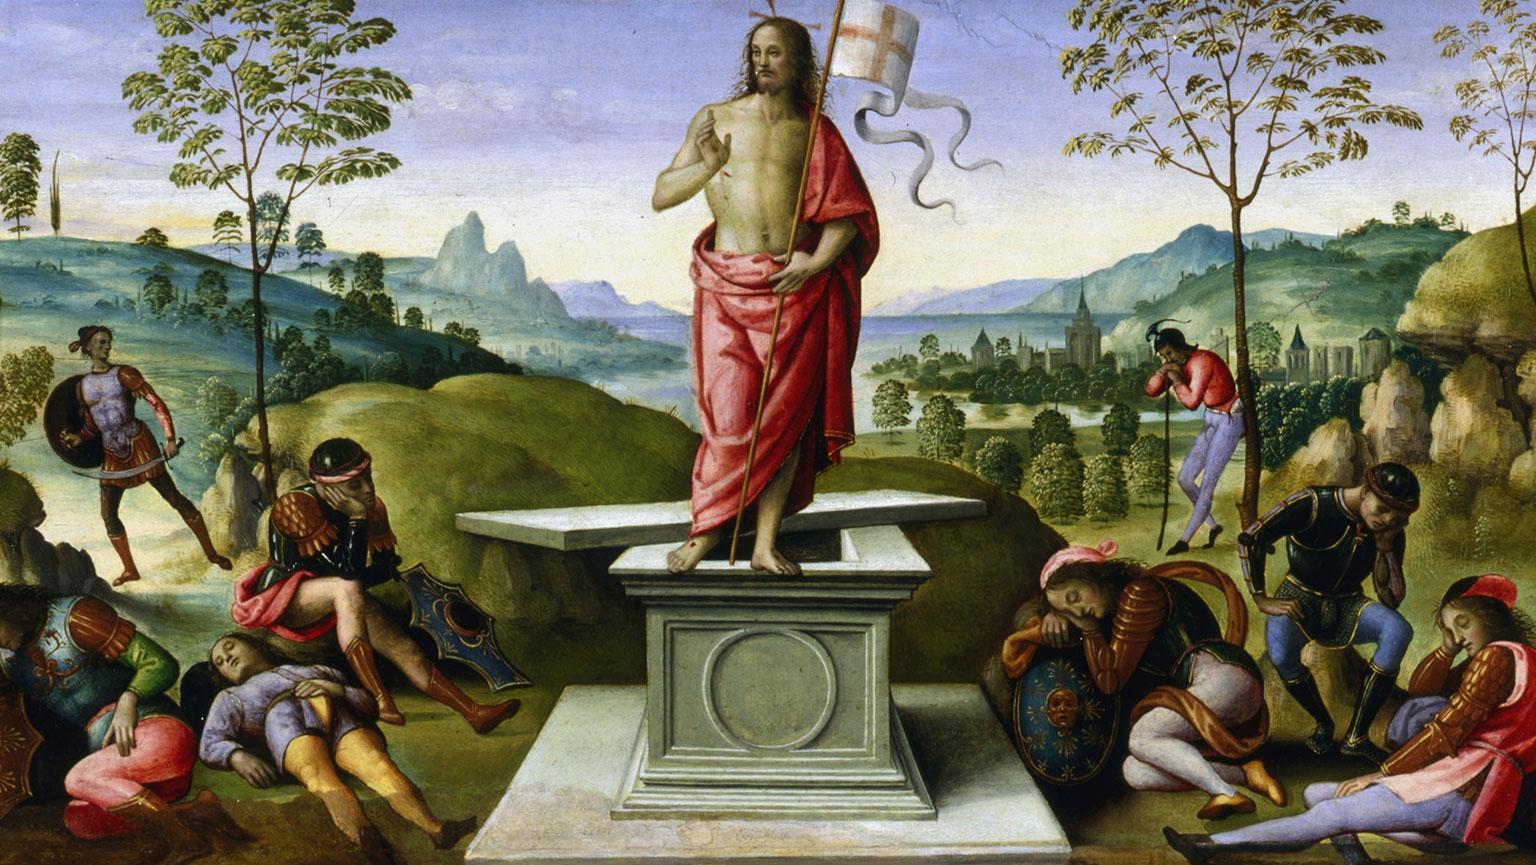 the backward movement of christology